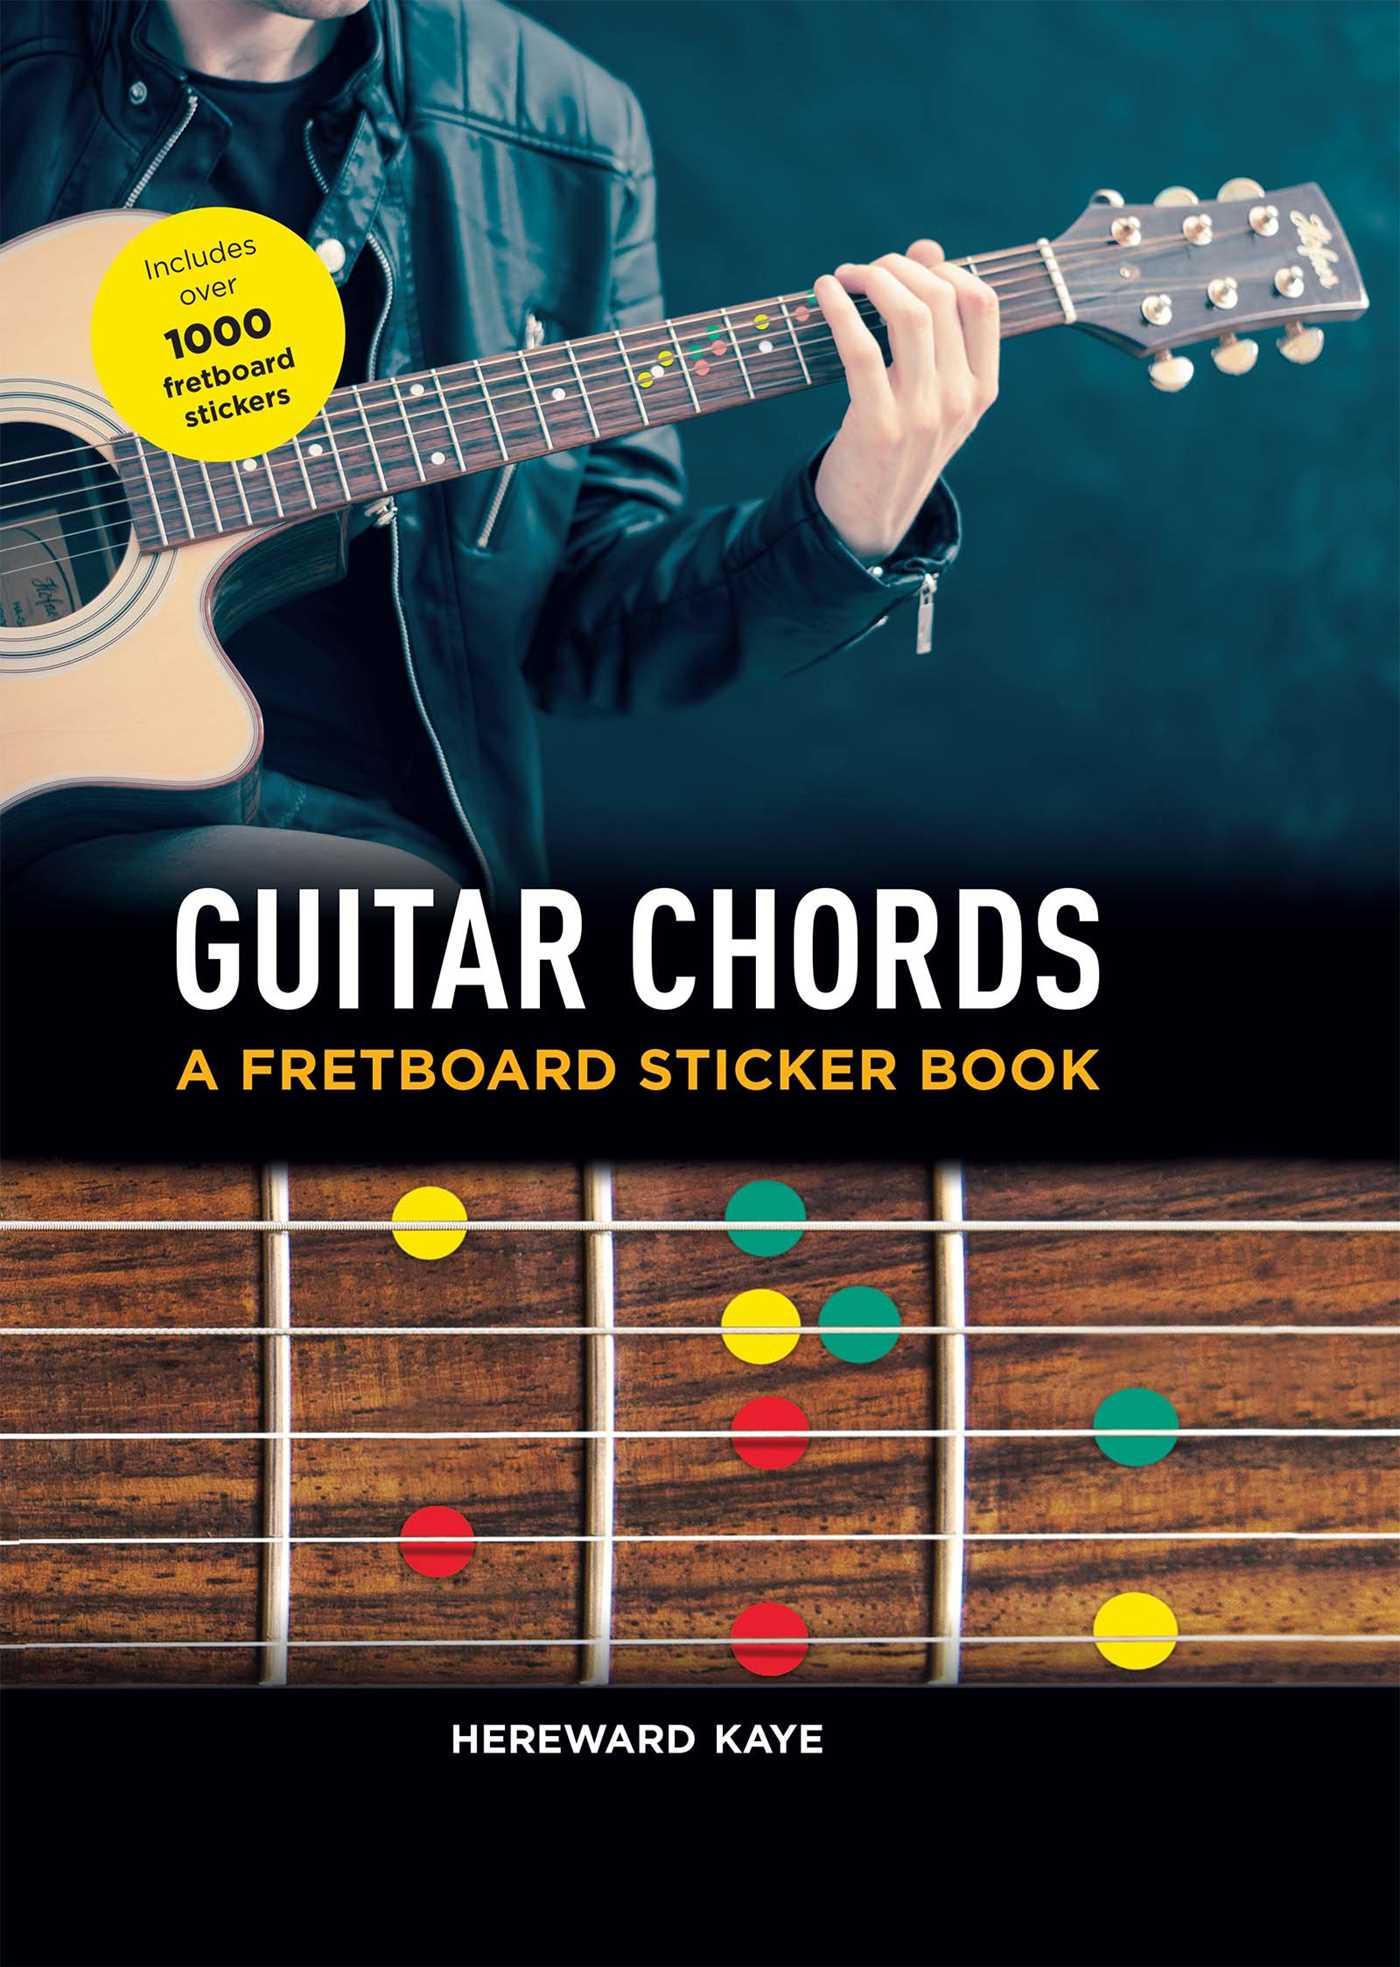 Guitar Chords A Fretboard Sticker Book Book By Hereward Kaye